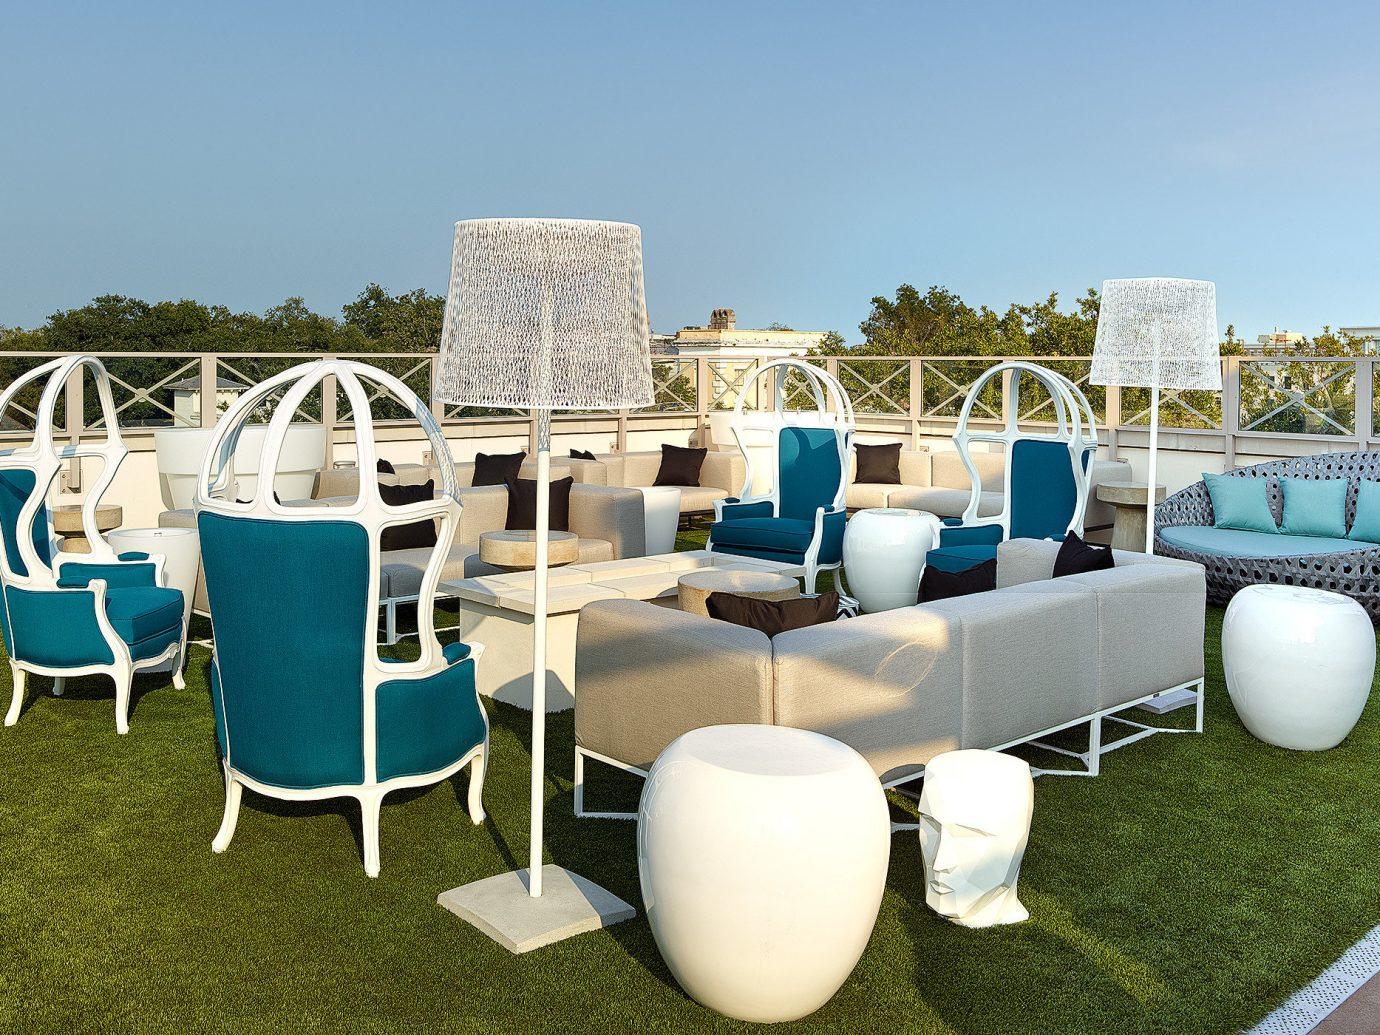 Hotels grass chair leisure room estate home backyard Design interior design furniture table swimming pool set area